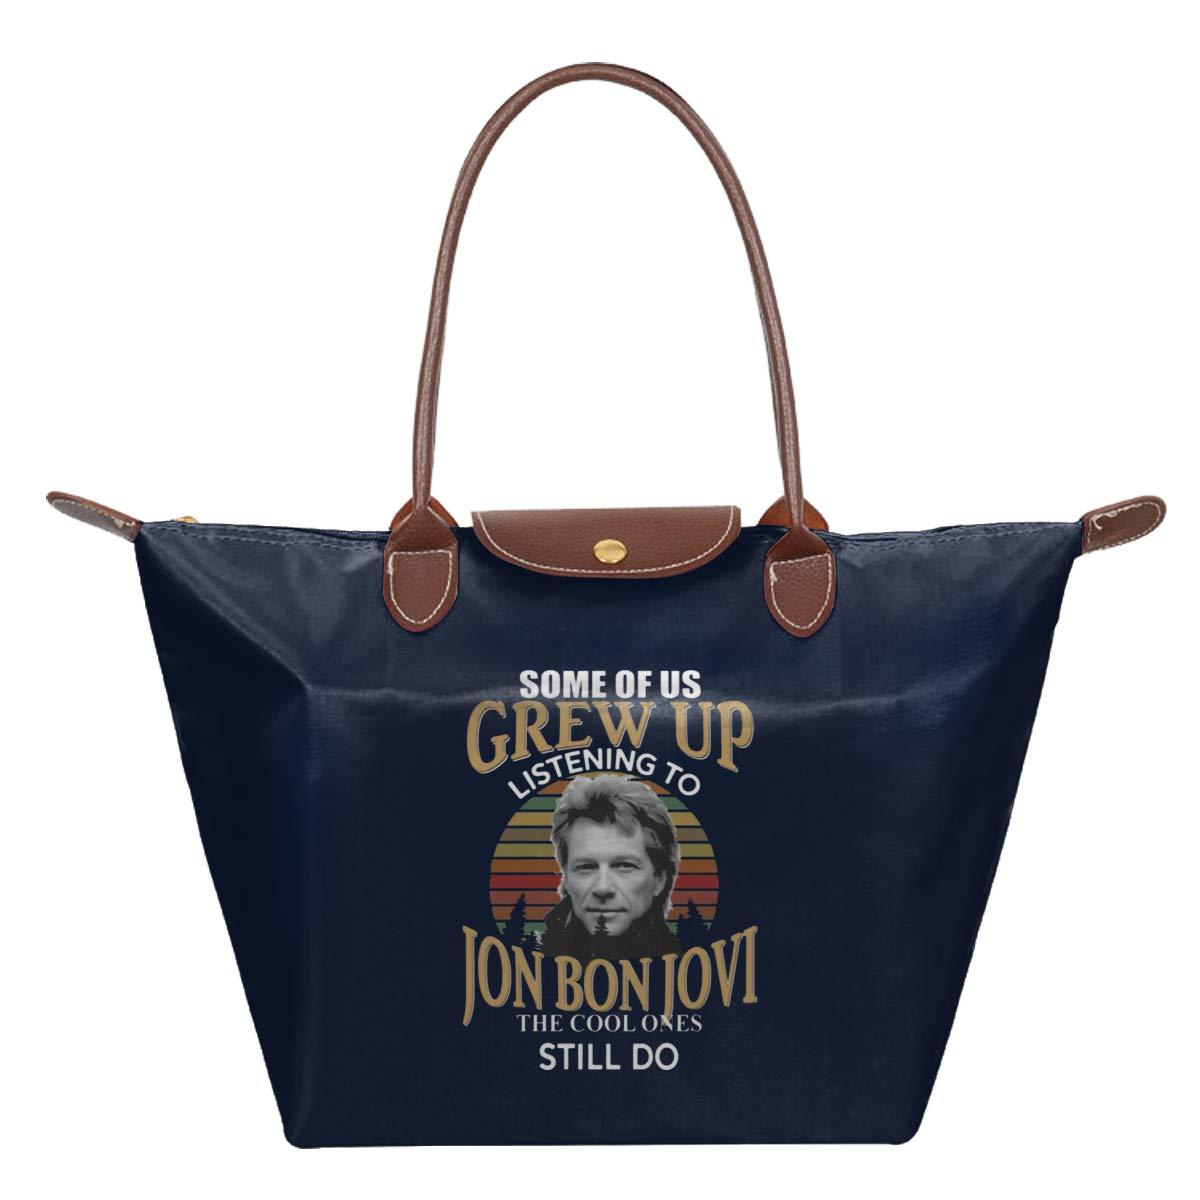 Some Of Us Grew Up Listening To Jon Bon Jovi The Cool Ones Still Do Waterproof Leather Folded Messenger Nylon Bag Travel Tote Hopping Folding School Handbags